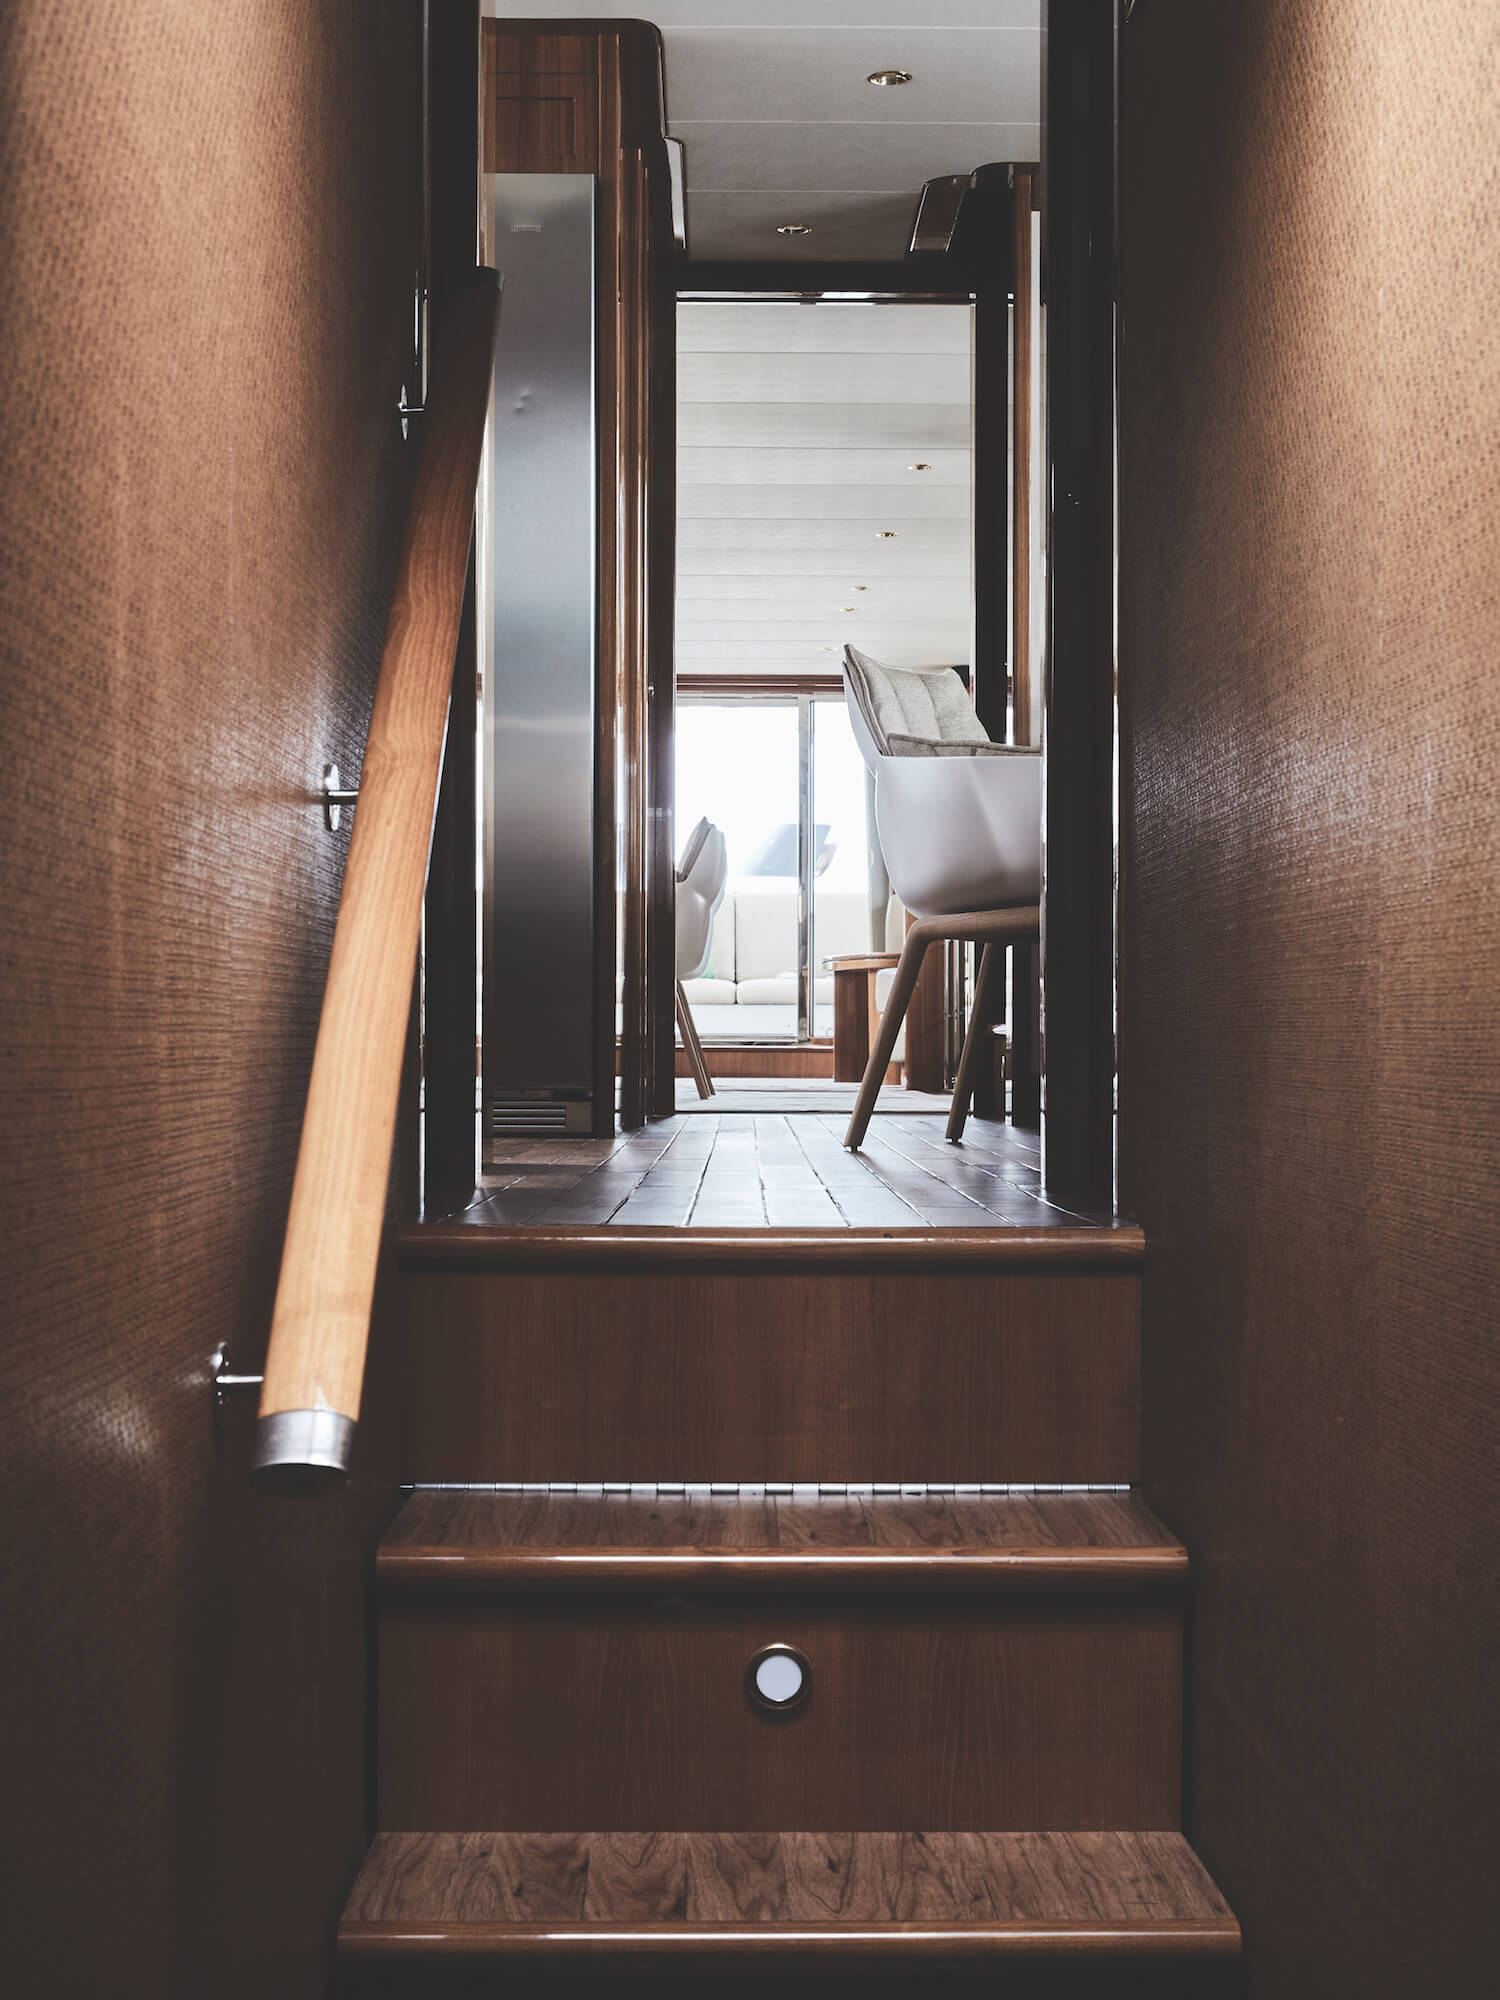 est living architecture robert bruce boat nexus designs 8